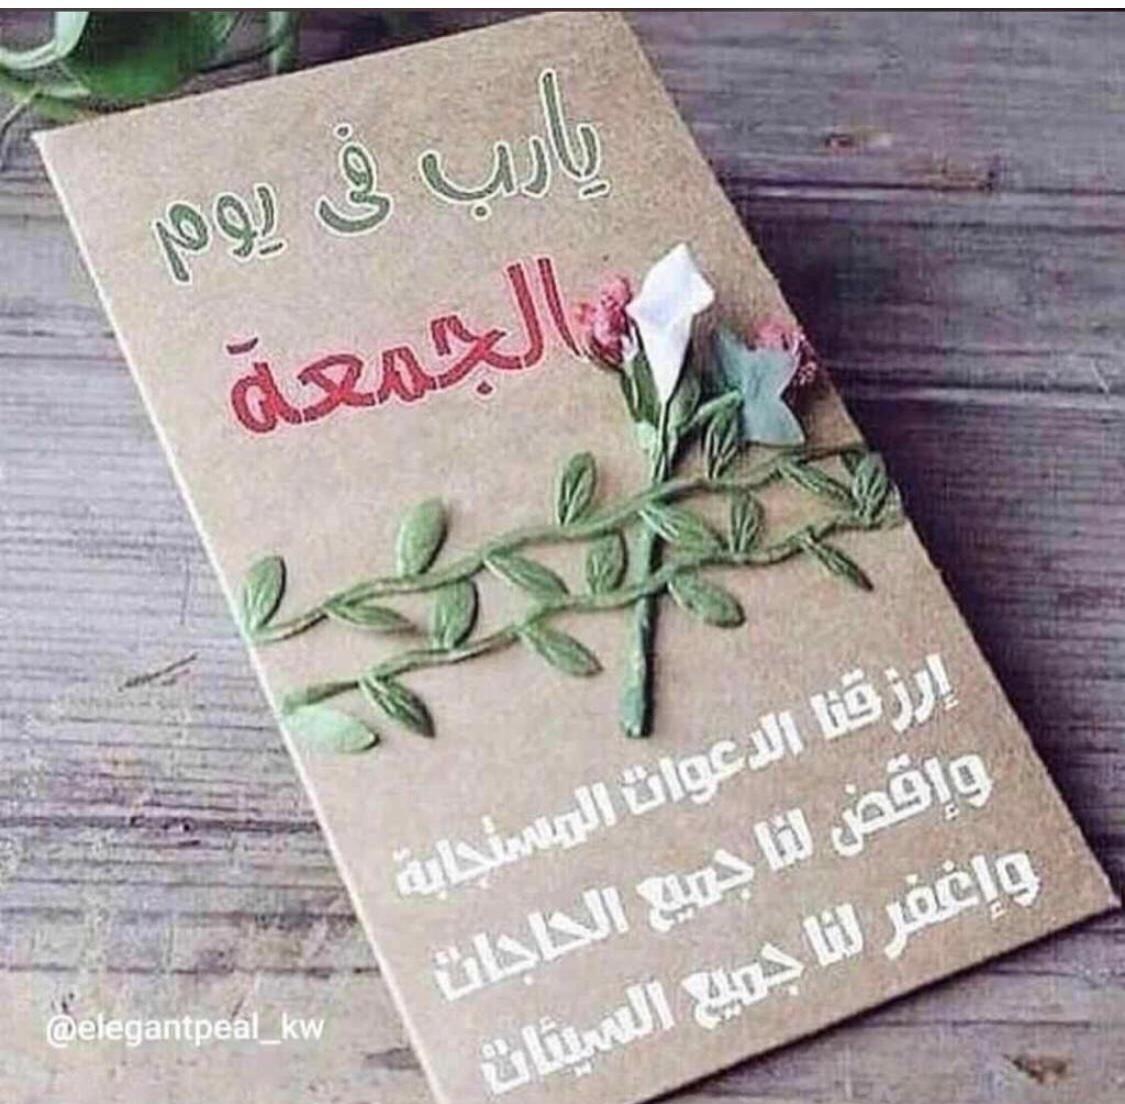 Pin By Vida Azar On الجمعة Blessed Friday Ramadan Decorations Romantic Love Quotes